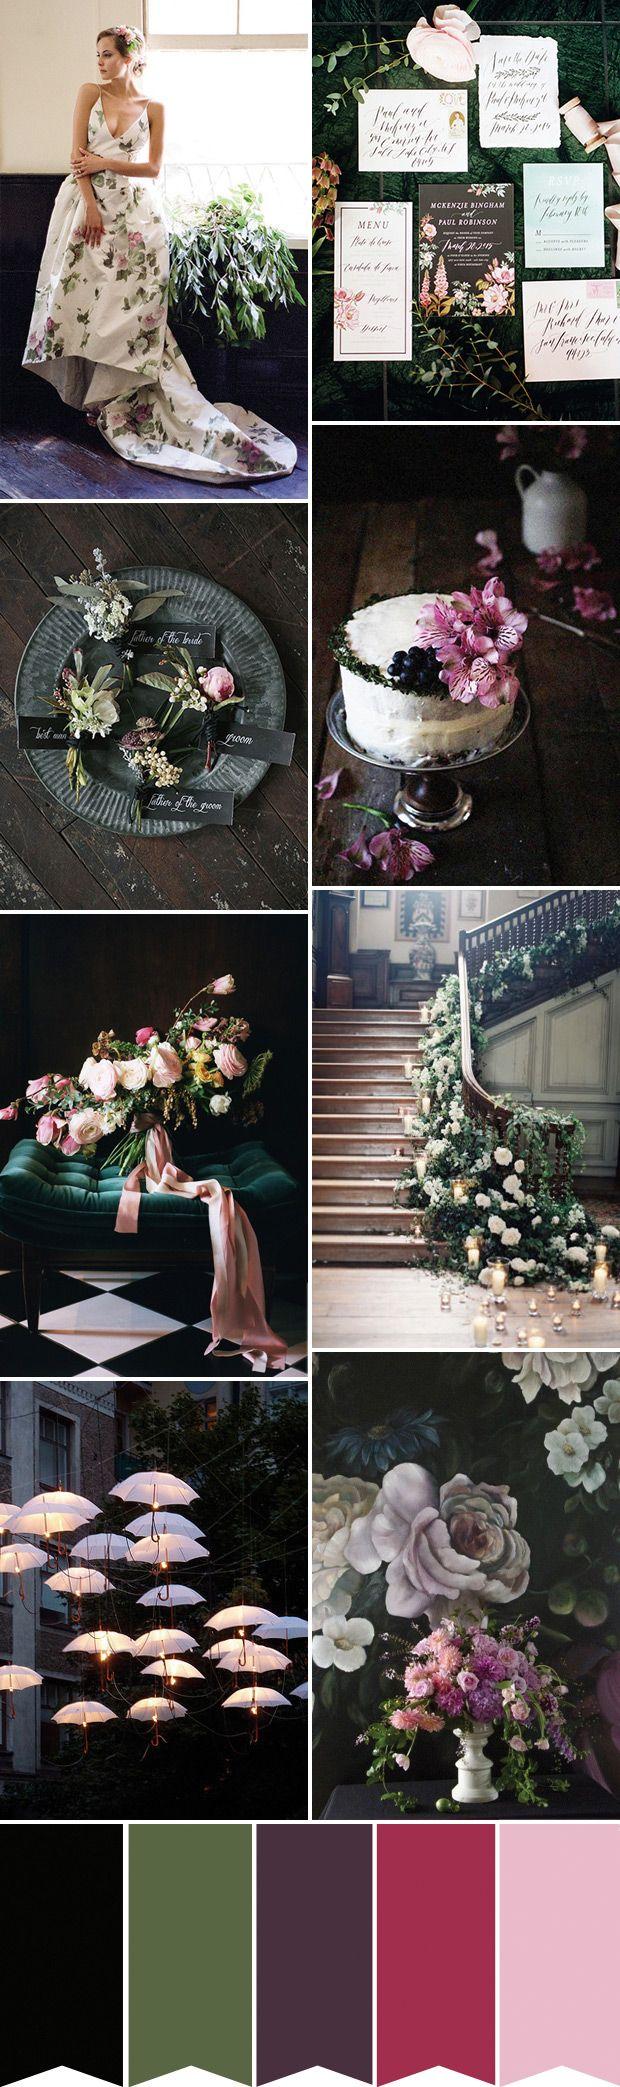 Daring and Dark Botanical Wedding Inspiration for dark wedding colour themes.